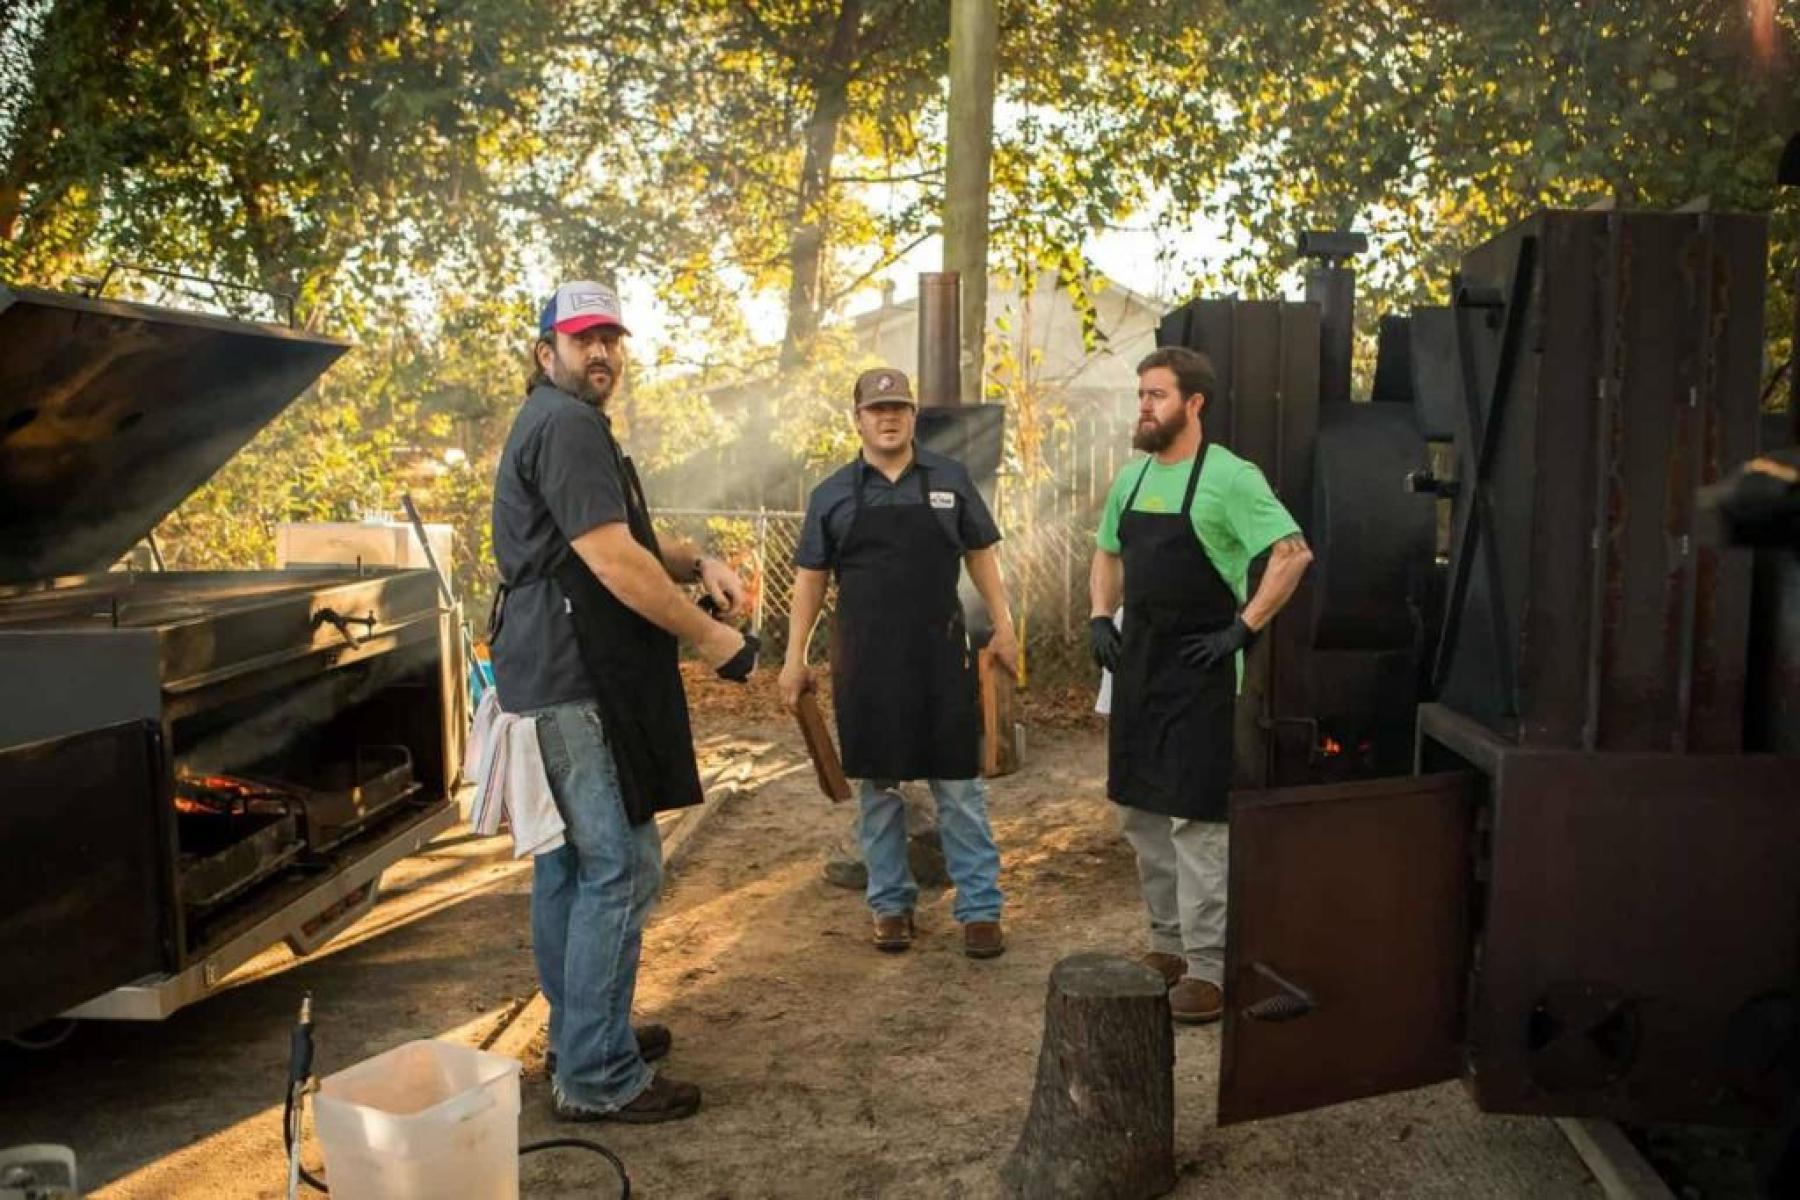 Madison Ruckel, Aaron Siegel, and Taylor Garrigan, founders of Home Team BBQ